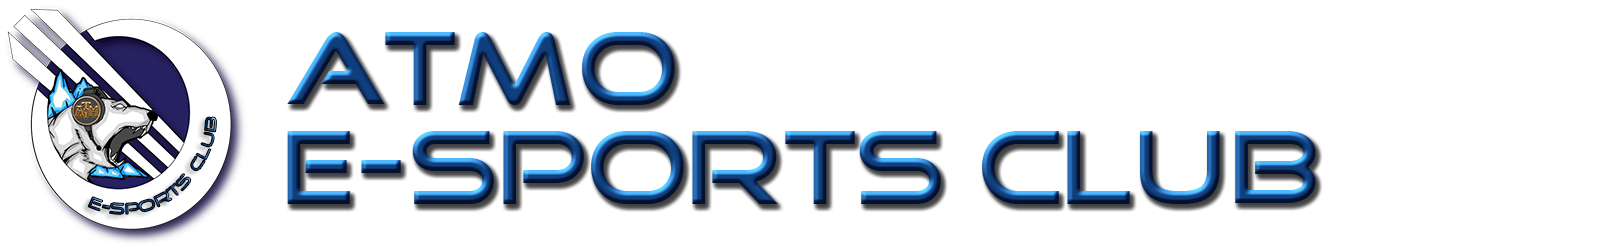 ATMO E-Sports Club